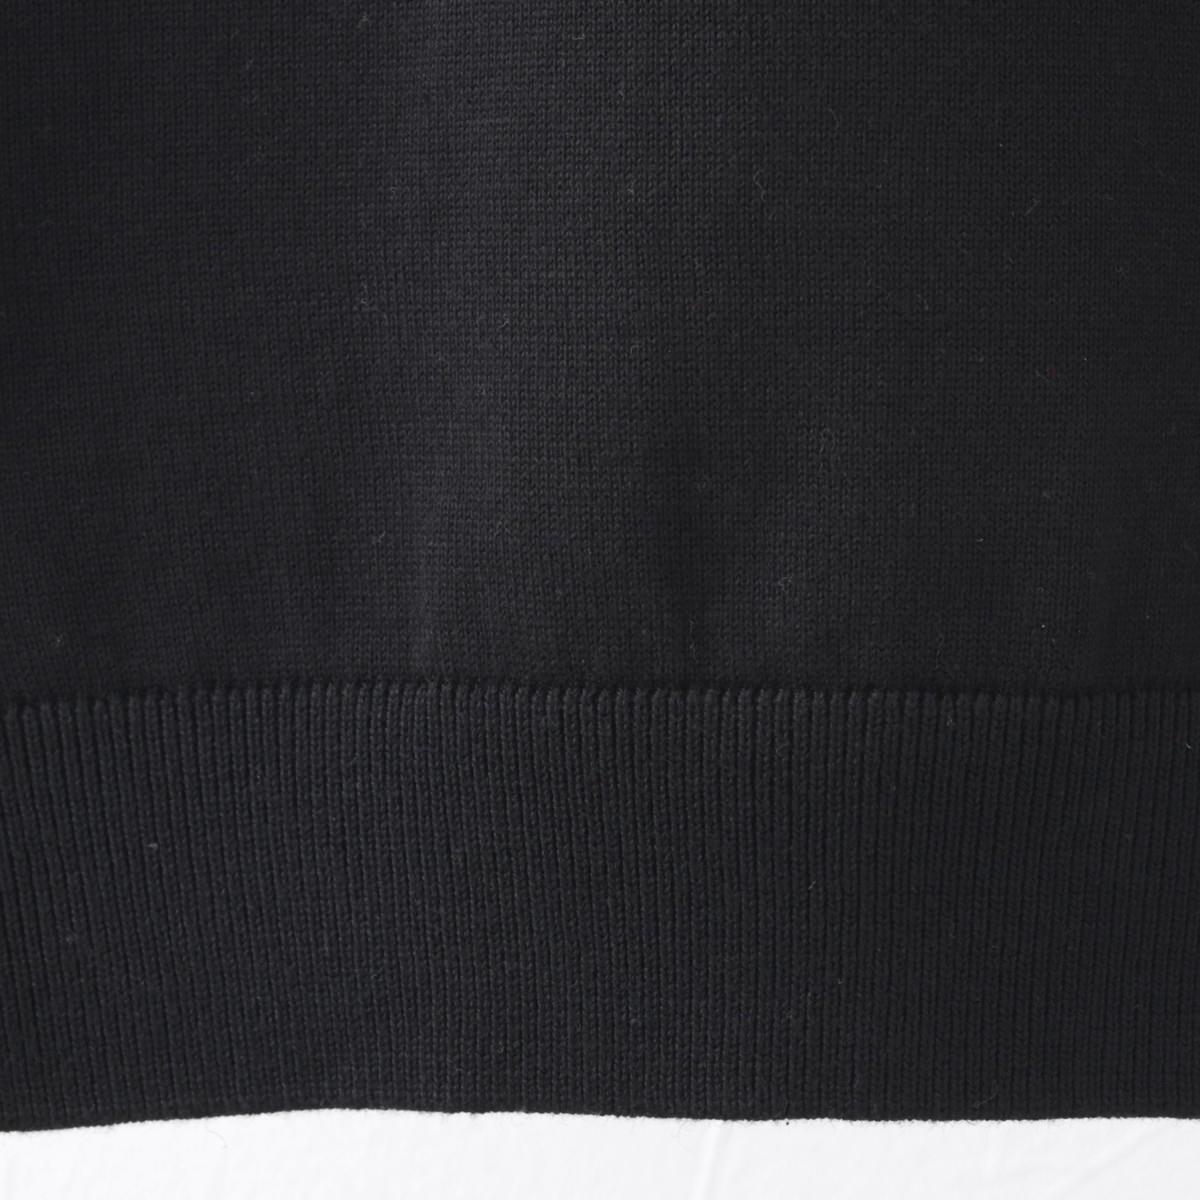 Gabicci メンズ ポロシャツ ポロ マルチストライプ ガビッチ 4色 シェード ブラック ネイビー ホワイト レトロ モッズファッション